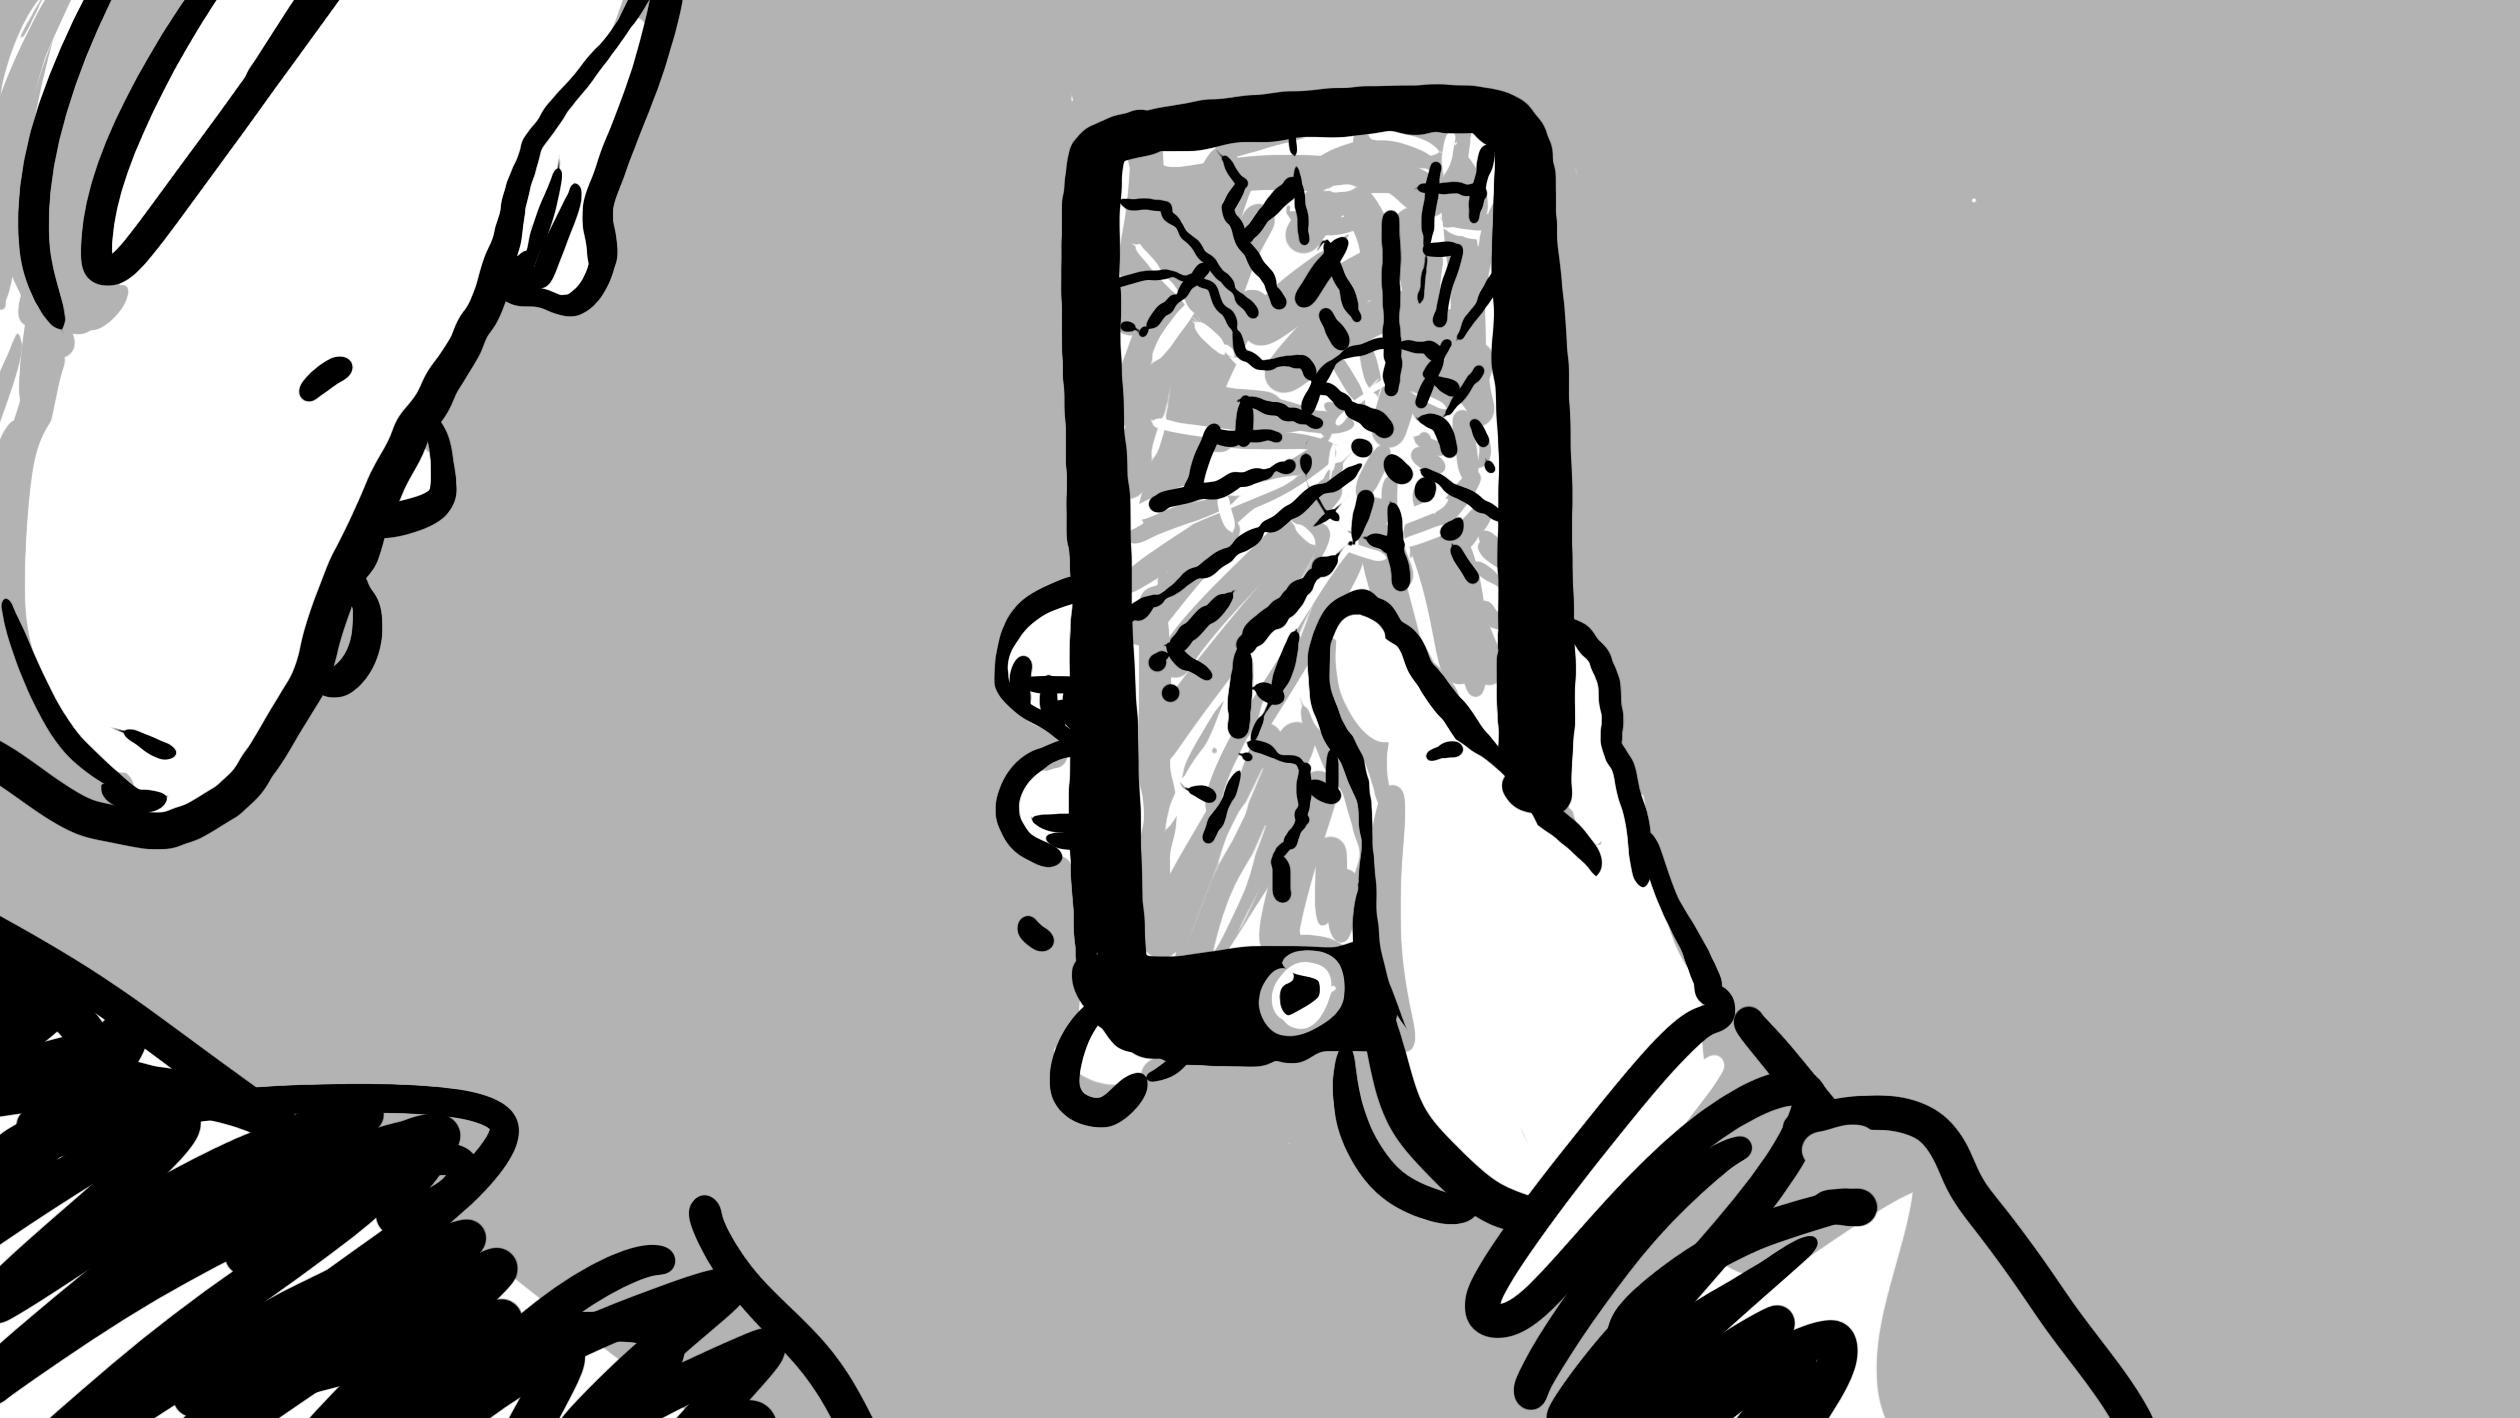 Bild aus Storyboard, Handy kaputt